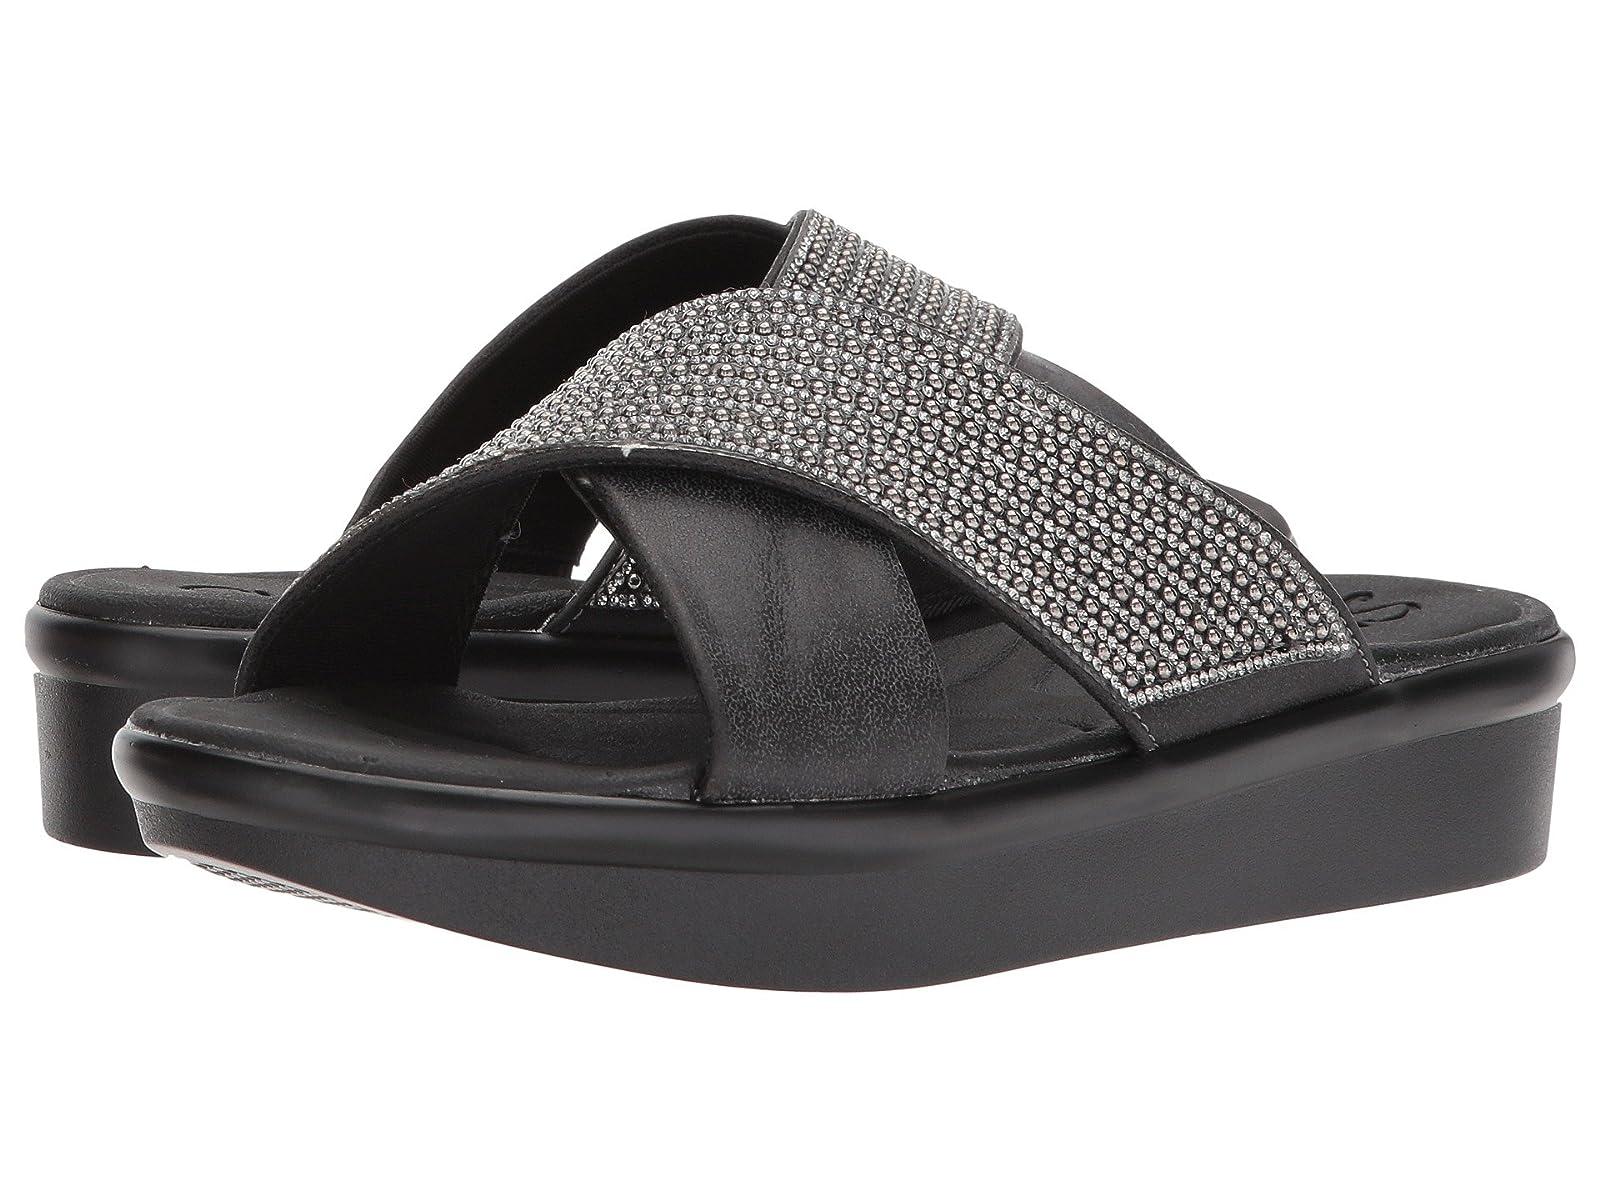 SKECHERS Bumblers - Summer ScorcherAtmospheric grades have affordable shoes